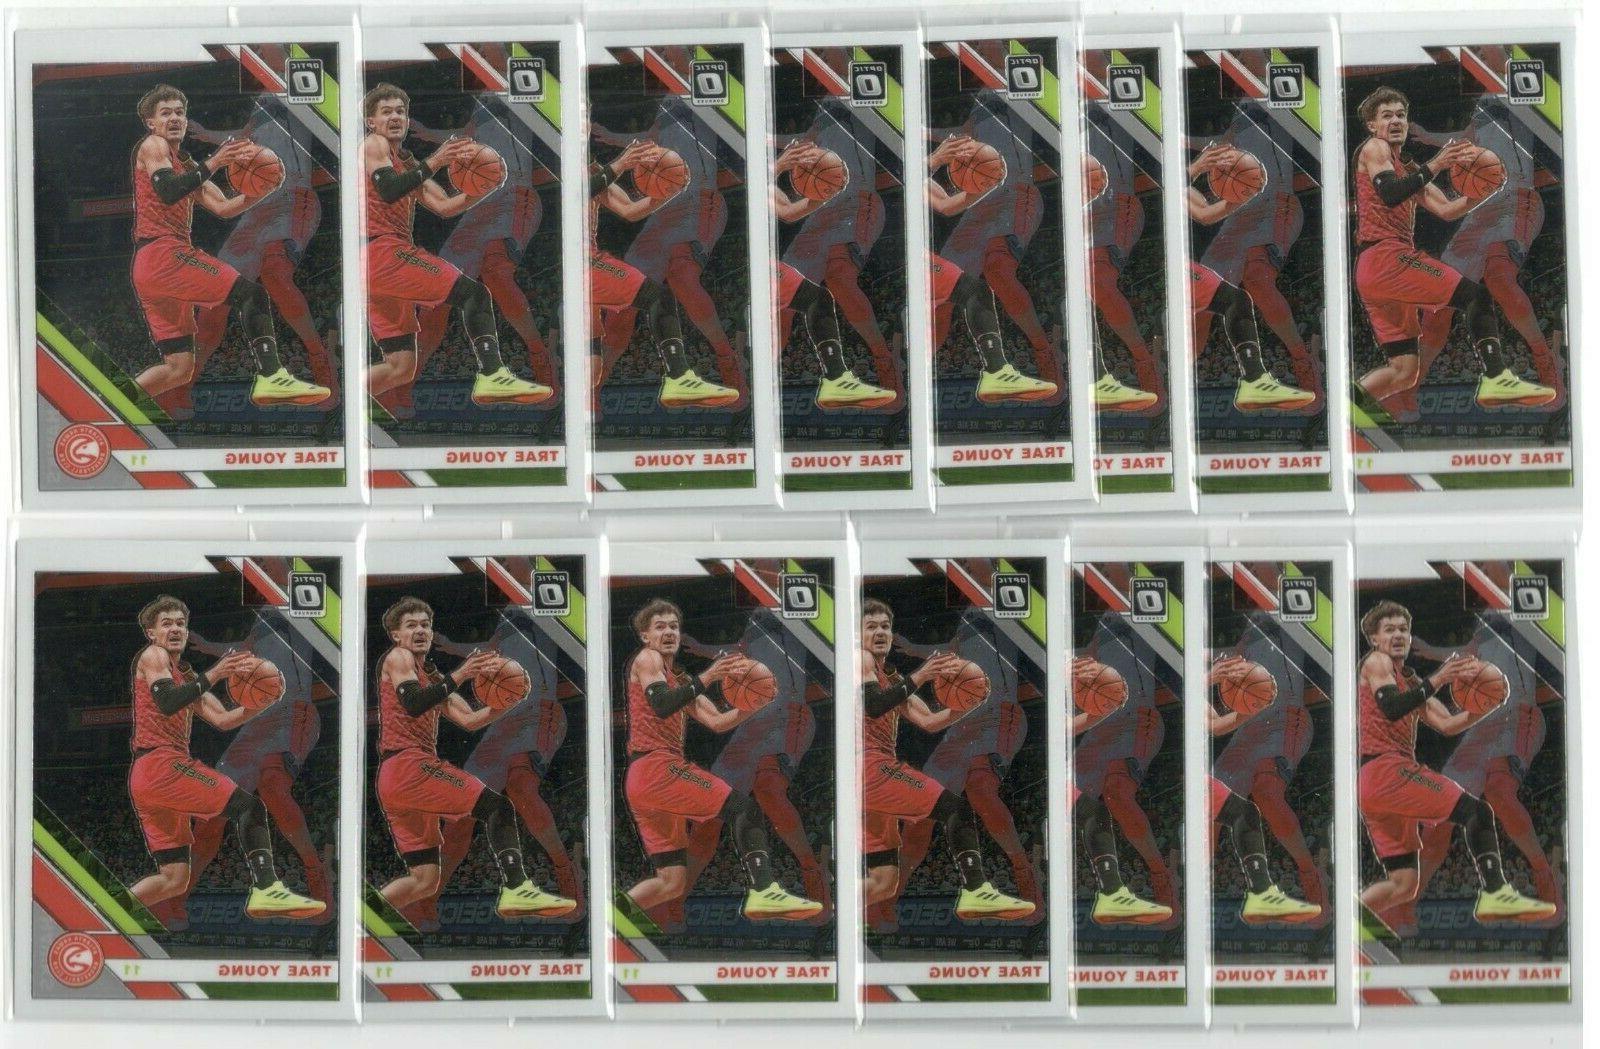 x26 TRAE YOUNG 2019-20 Panini Optic #2 Basketball Card lot/s